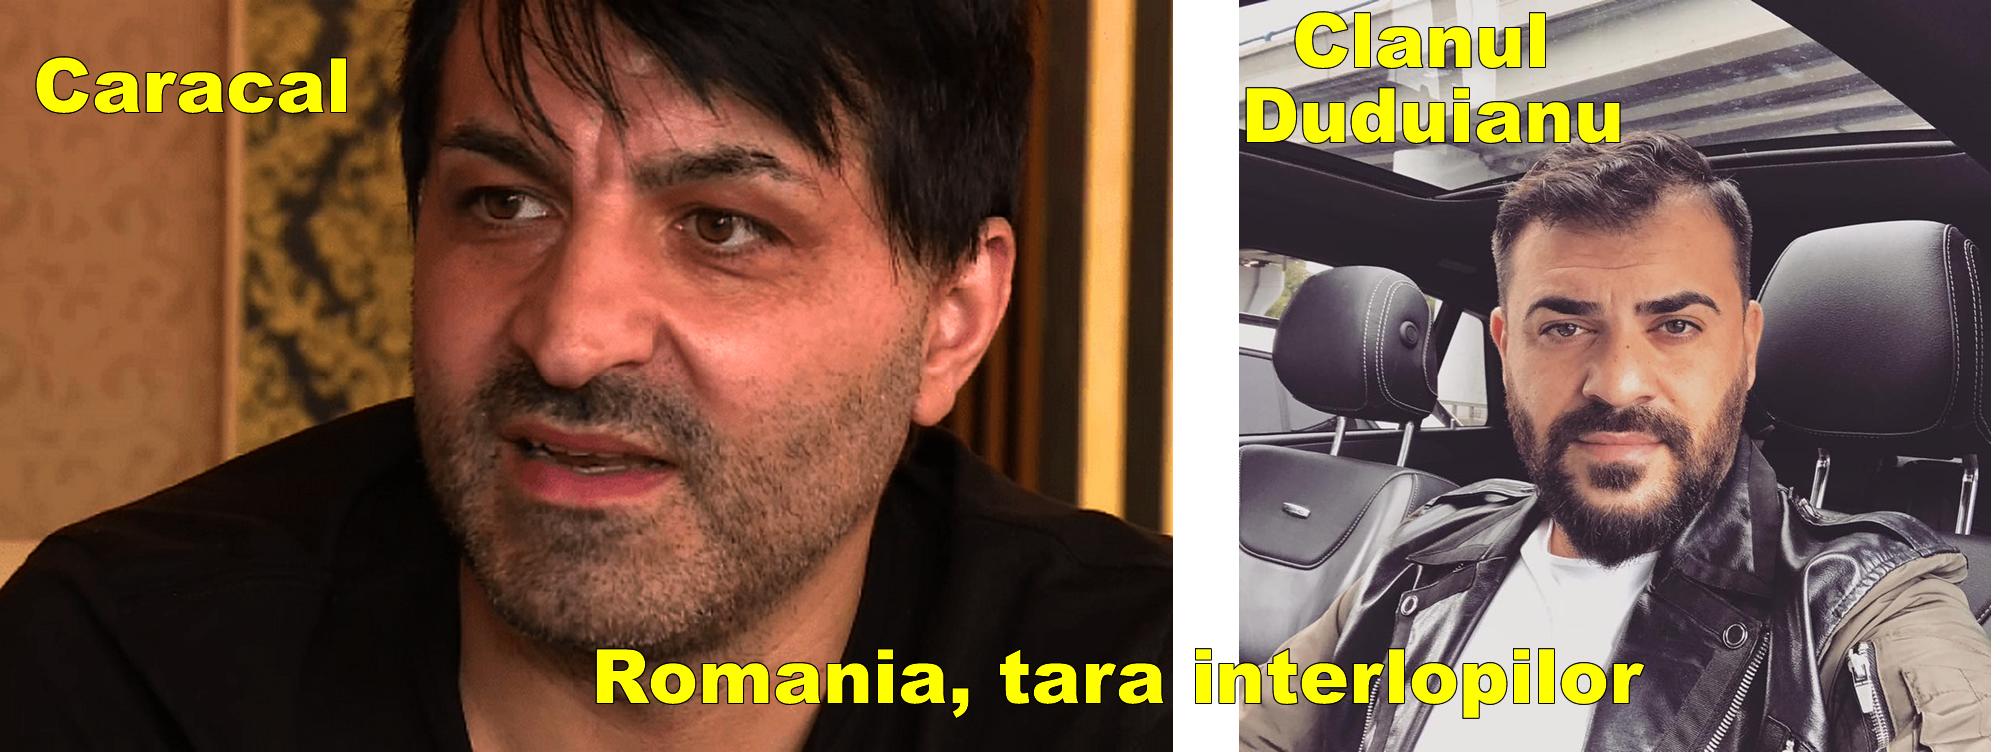 Romania, tara interlopilor